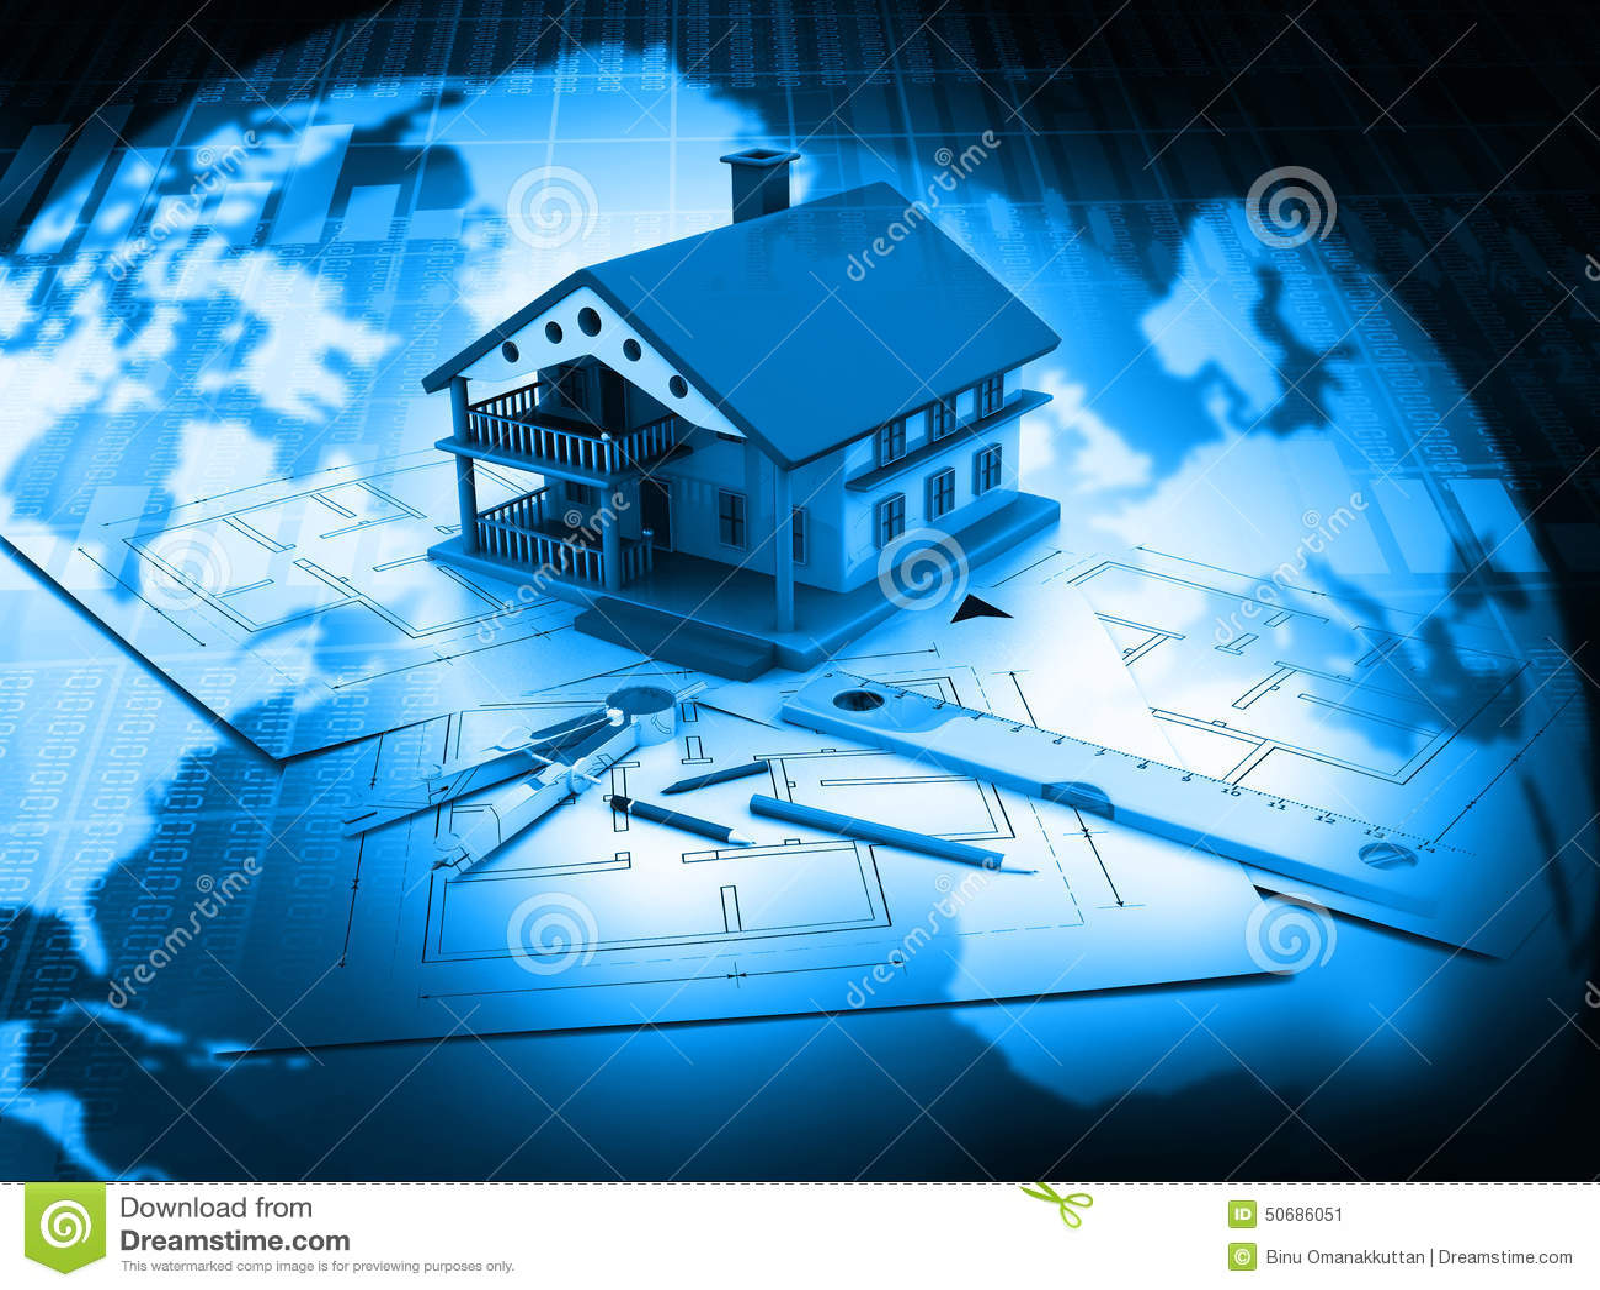 Download 3d计划图纸的房子 库存例证. 插画 包括有 草拟, 抽象, 全球, 纸张, 背包, 蓝色, 想法, 缩放比例 - 50686051